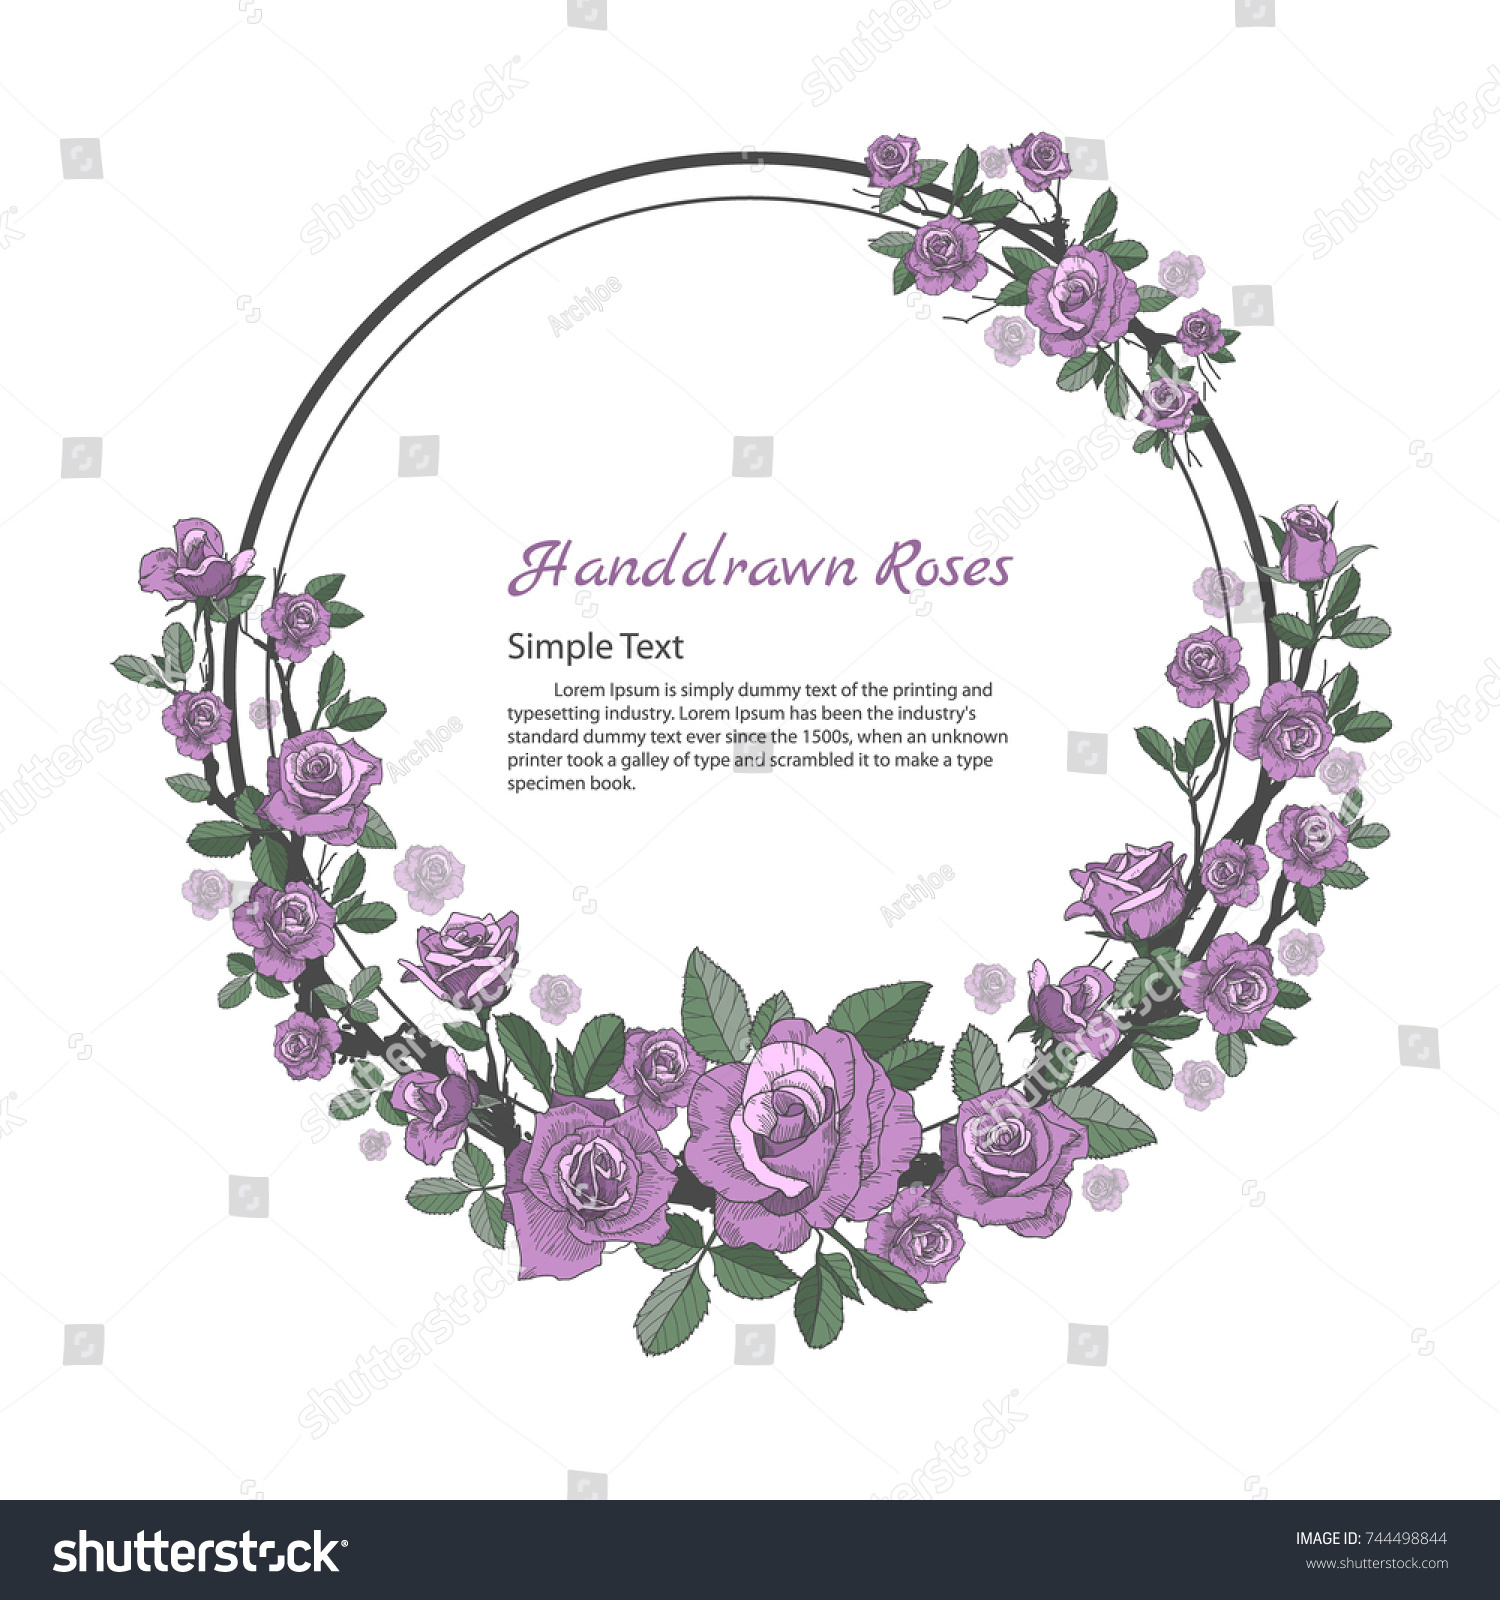 Flower Frame Rose Drawing Sketch On Stock-Vektorgrafik 744498844 ...